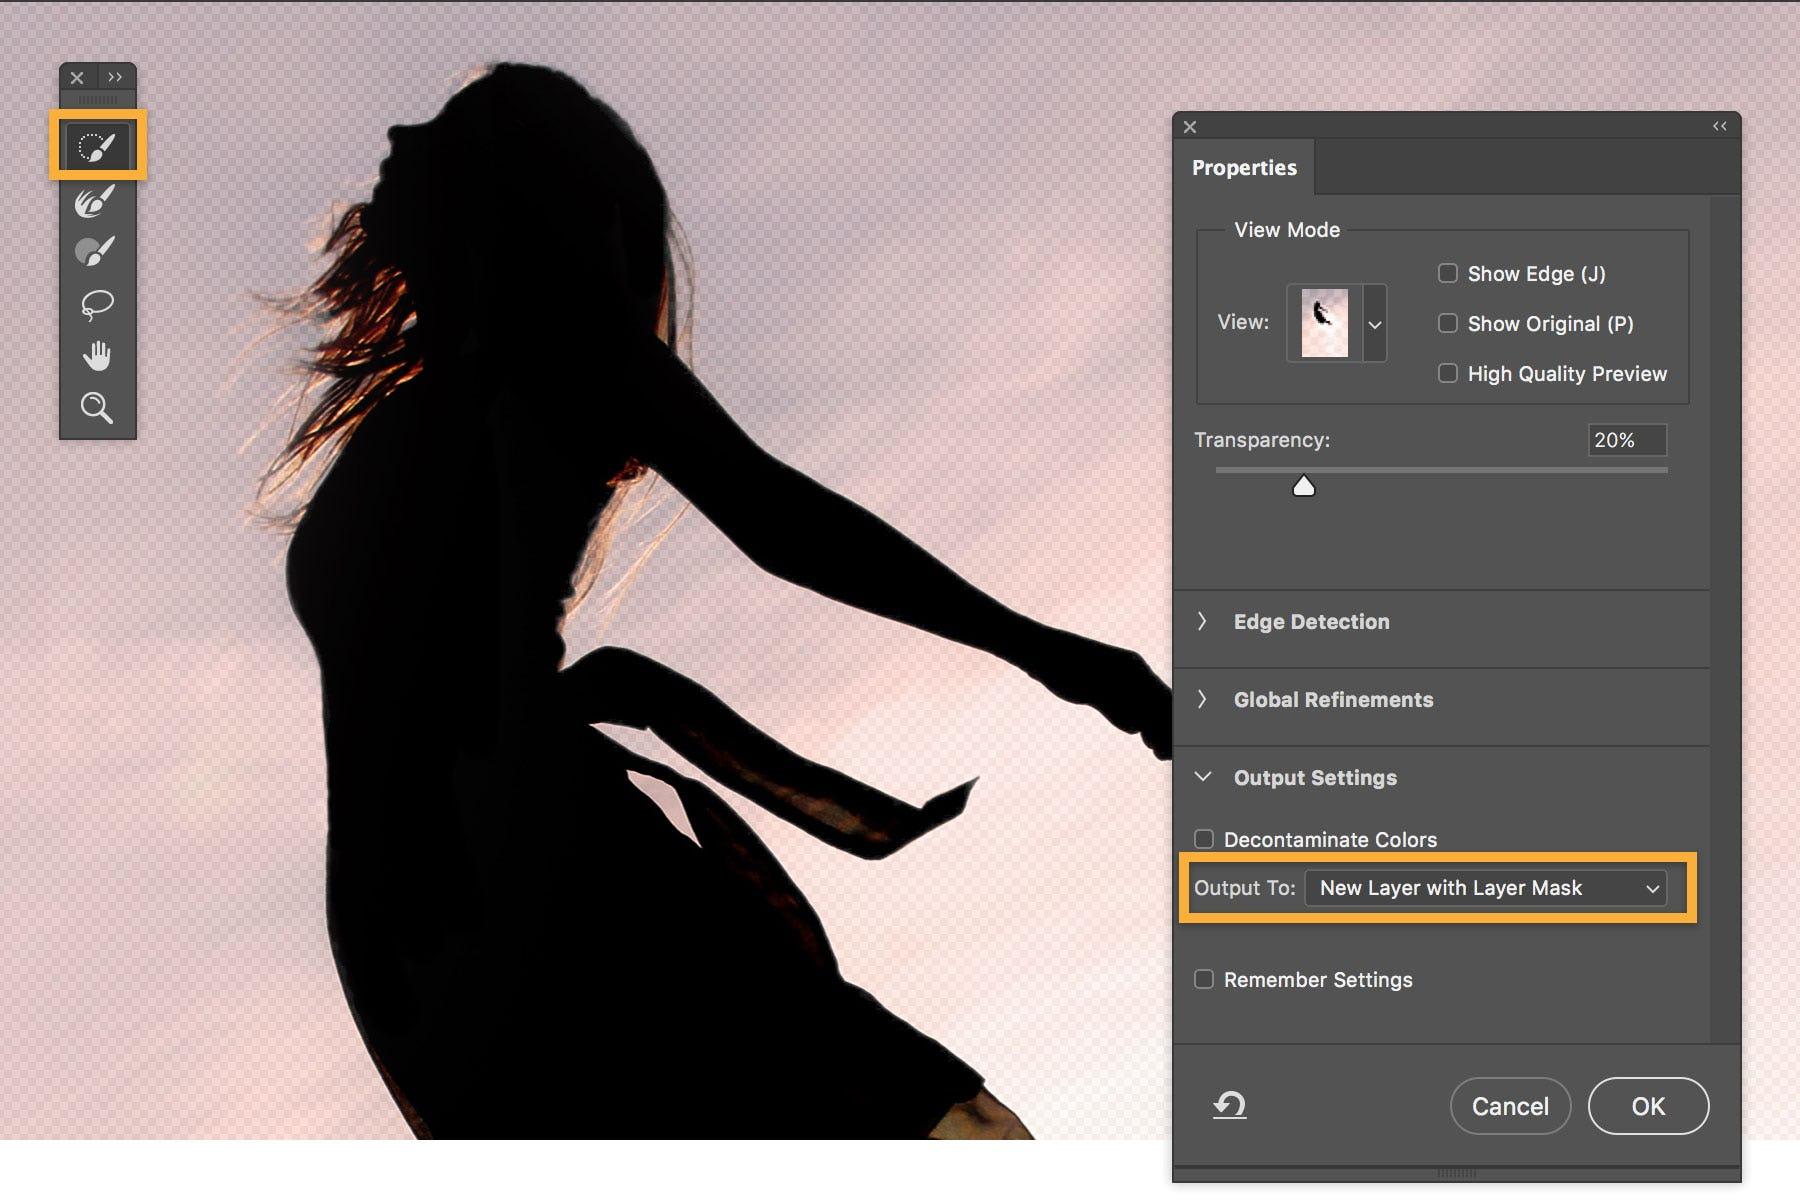 Adobe Photoshop Software - 2